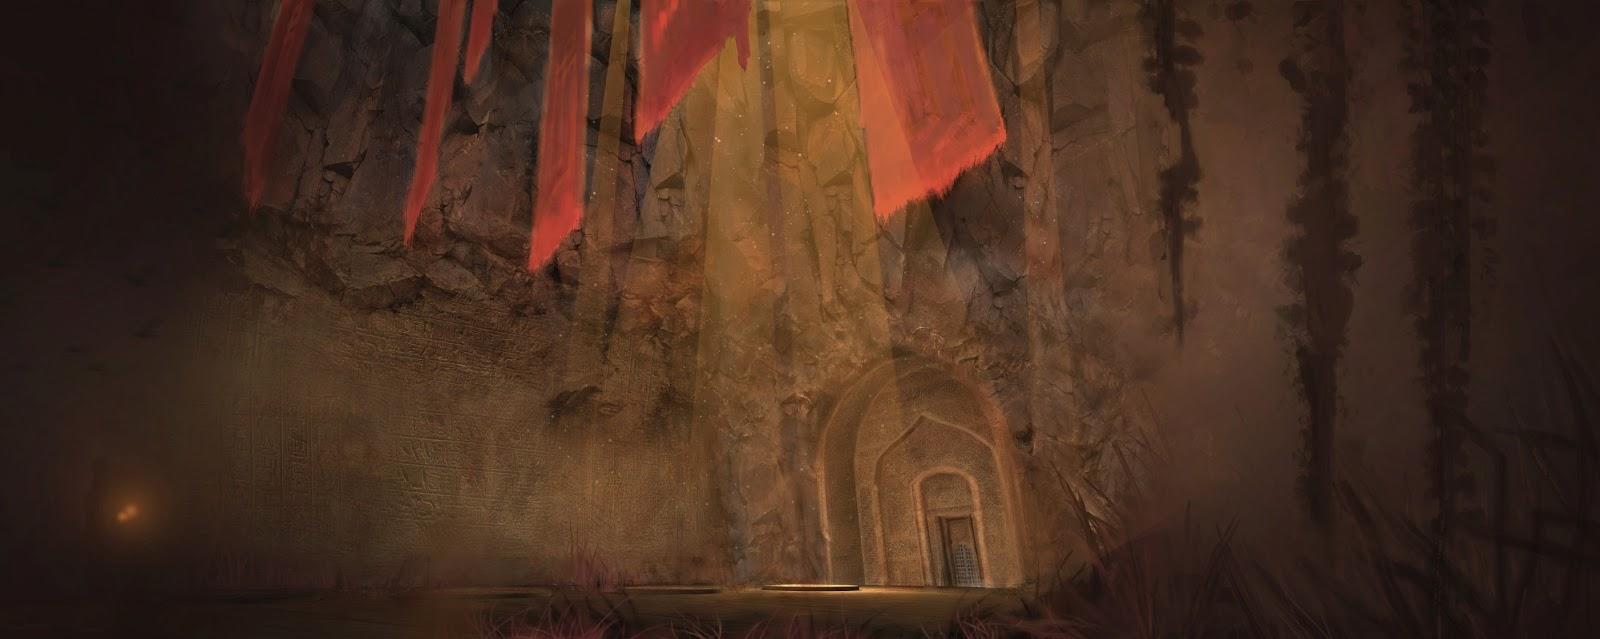 temple_entrance4.jpg